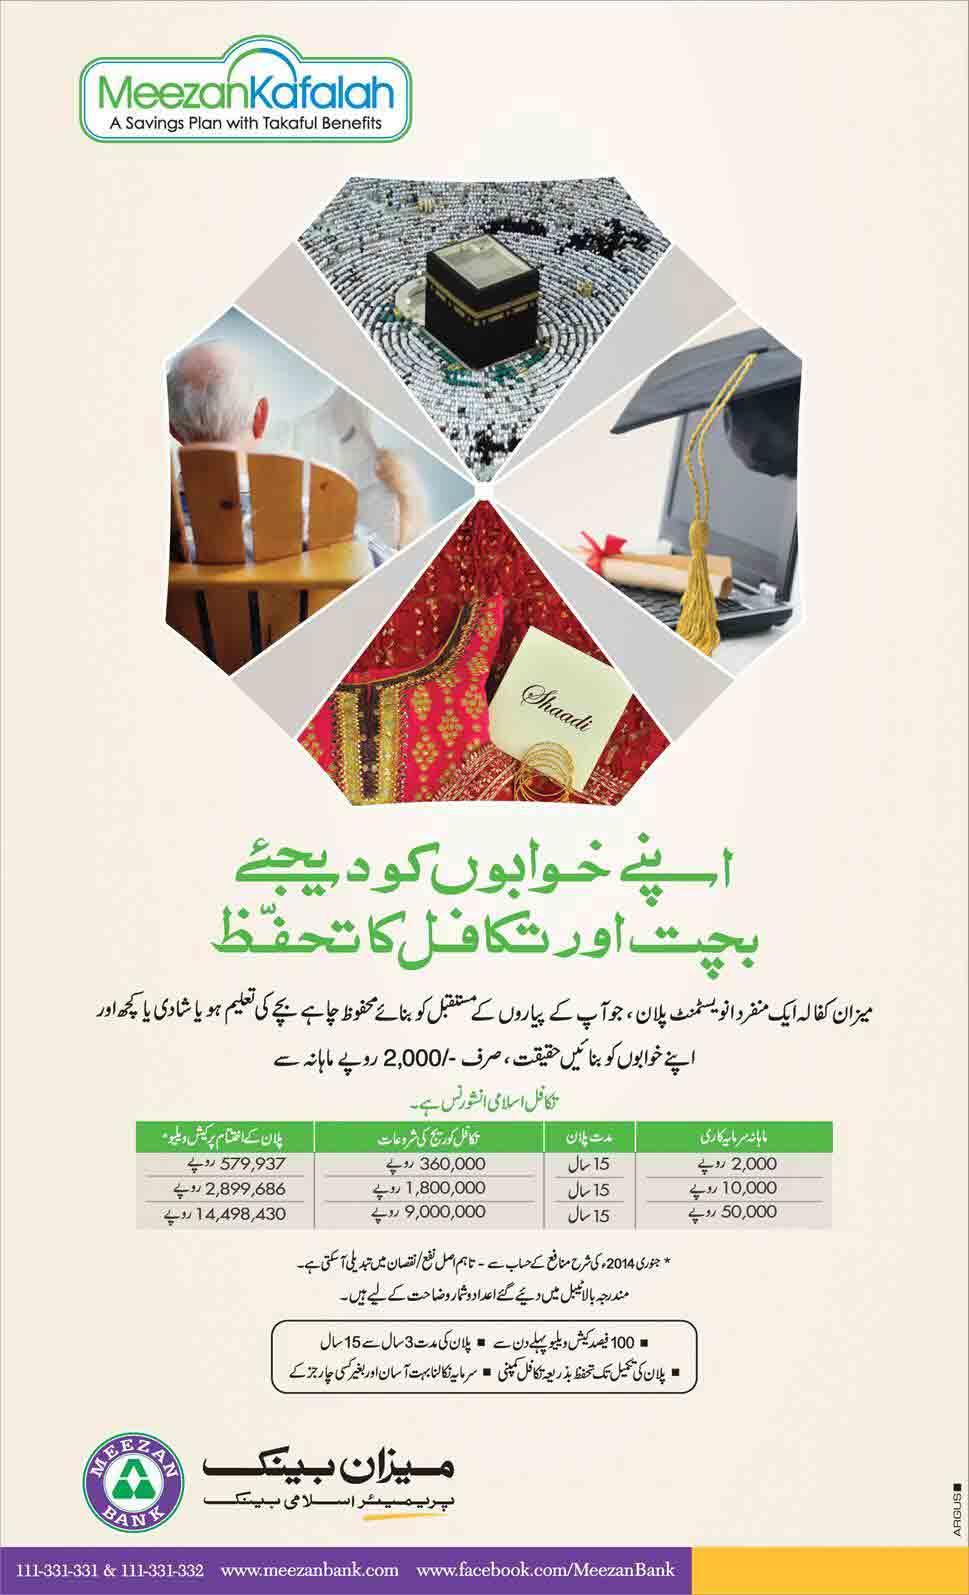 Meezan Bank Saving Plan with Takaful Benefits